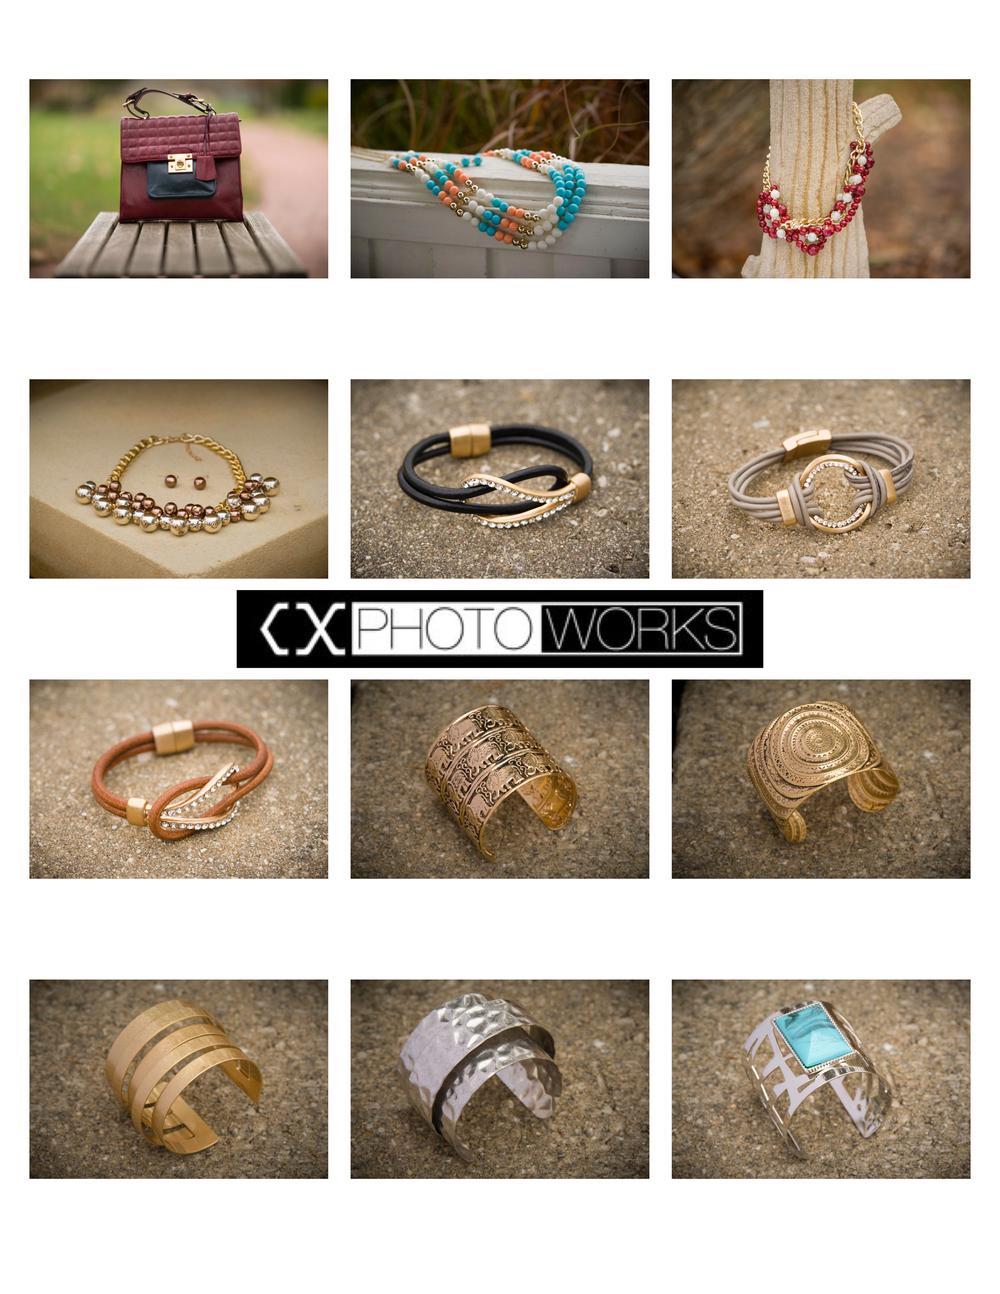 Fashion Accessories: Jewelry & Handbags (Contact Sheet 2)